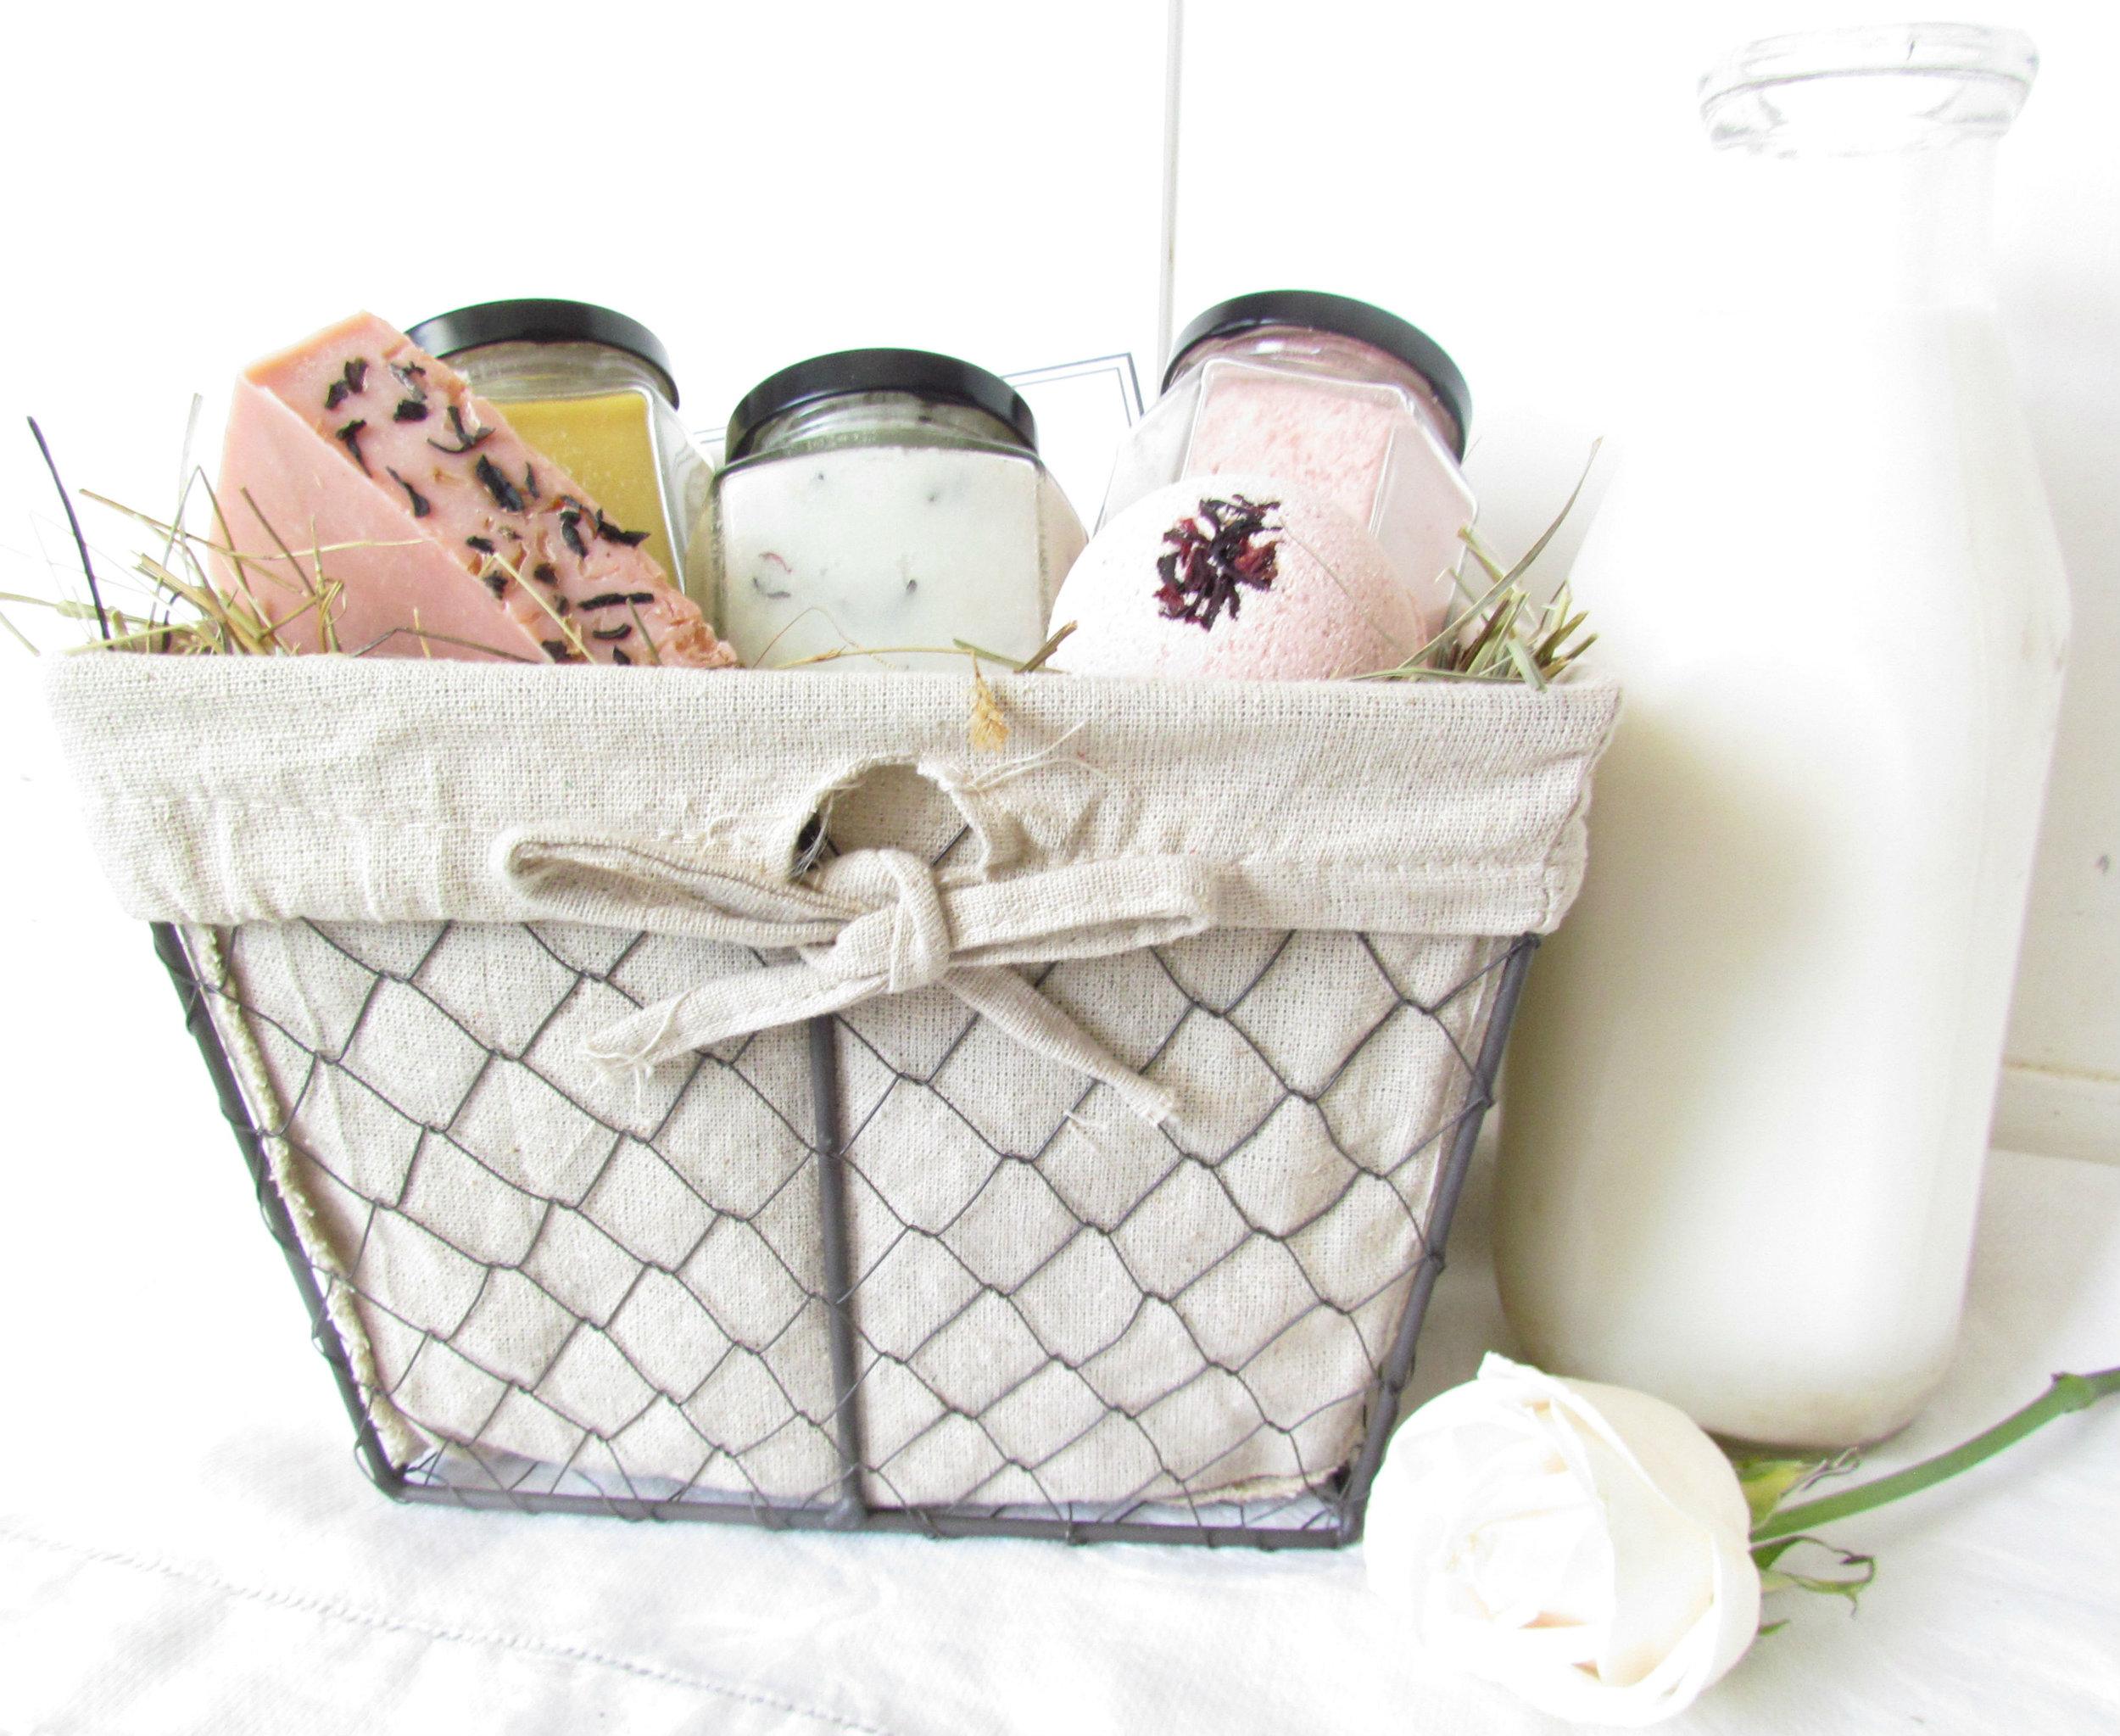 Soothing Rose Hibiscus Sheep Milk Basket.jpg